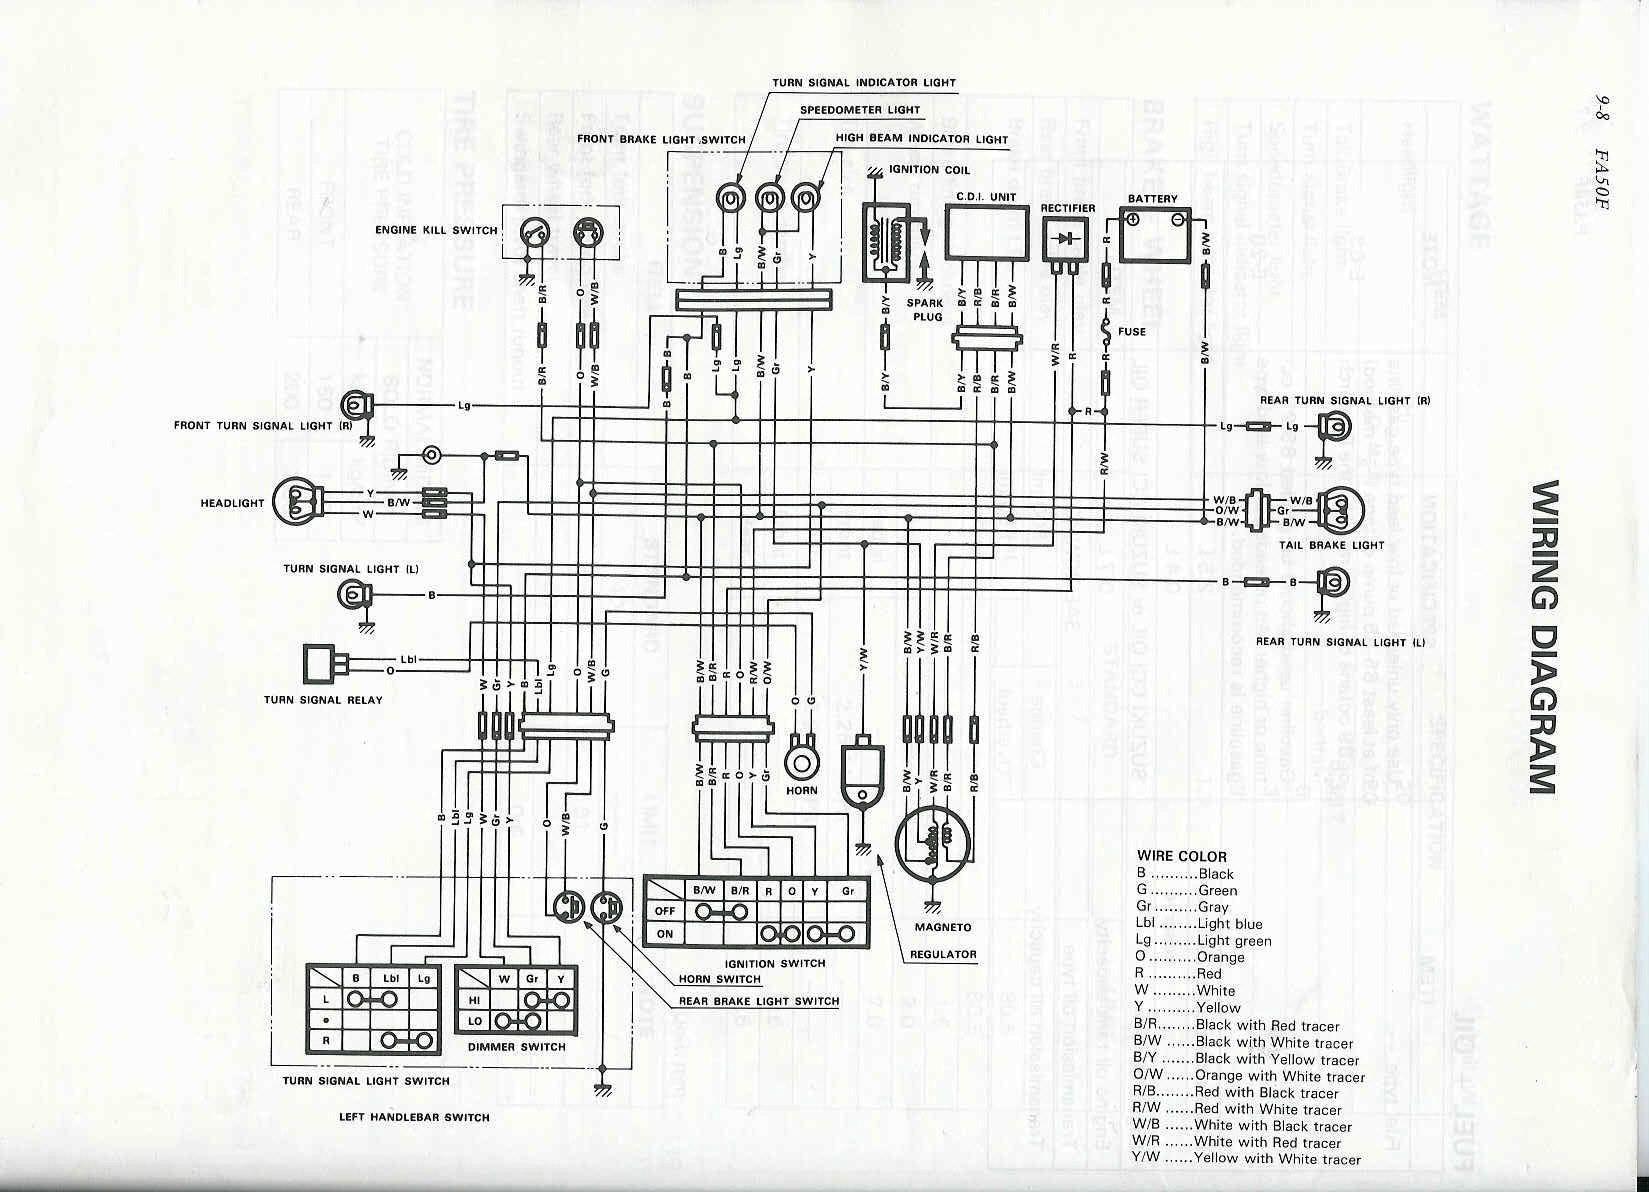 tags: #66 triumph spitfire wiring diagram#color wiring diagram for 1977 triumph  spitfire#1976 triumph tr6 wiring diagram#triumph mk3 wiring diagram#triumph